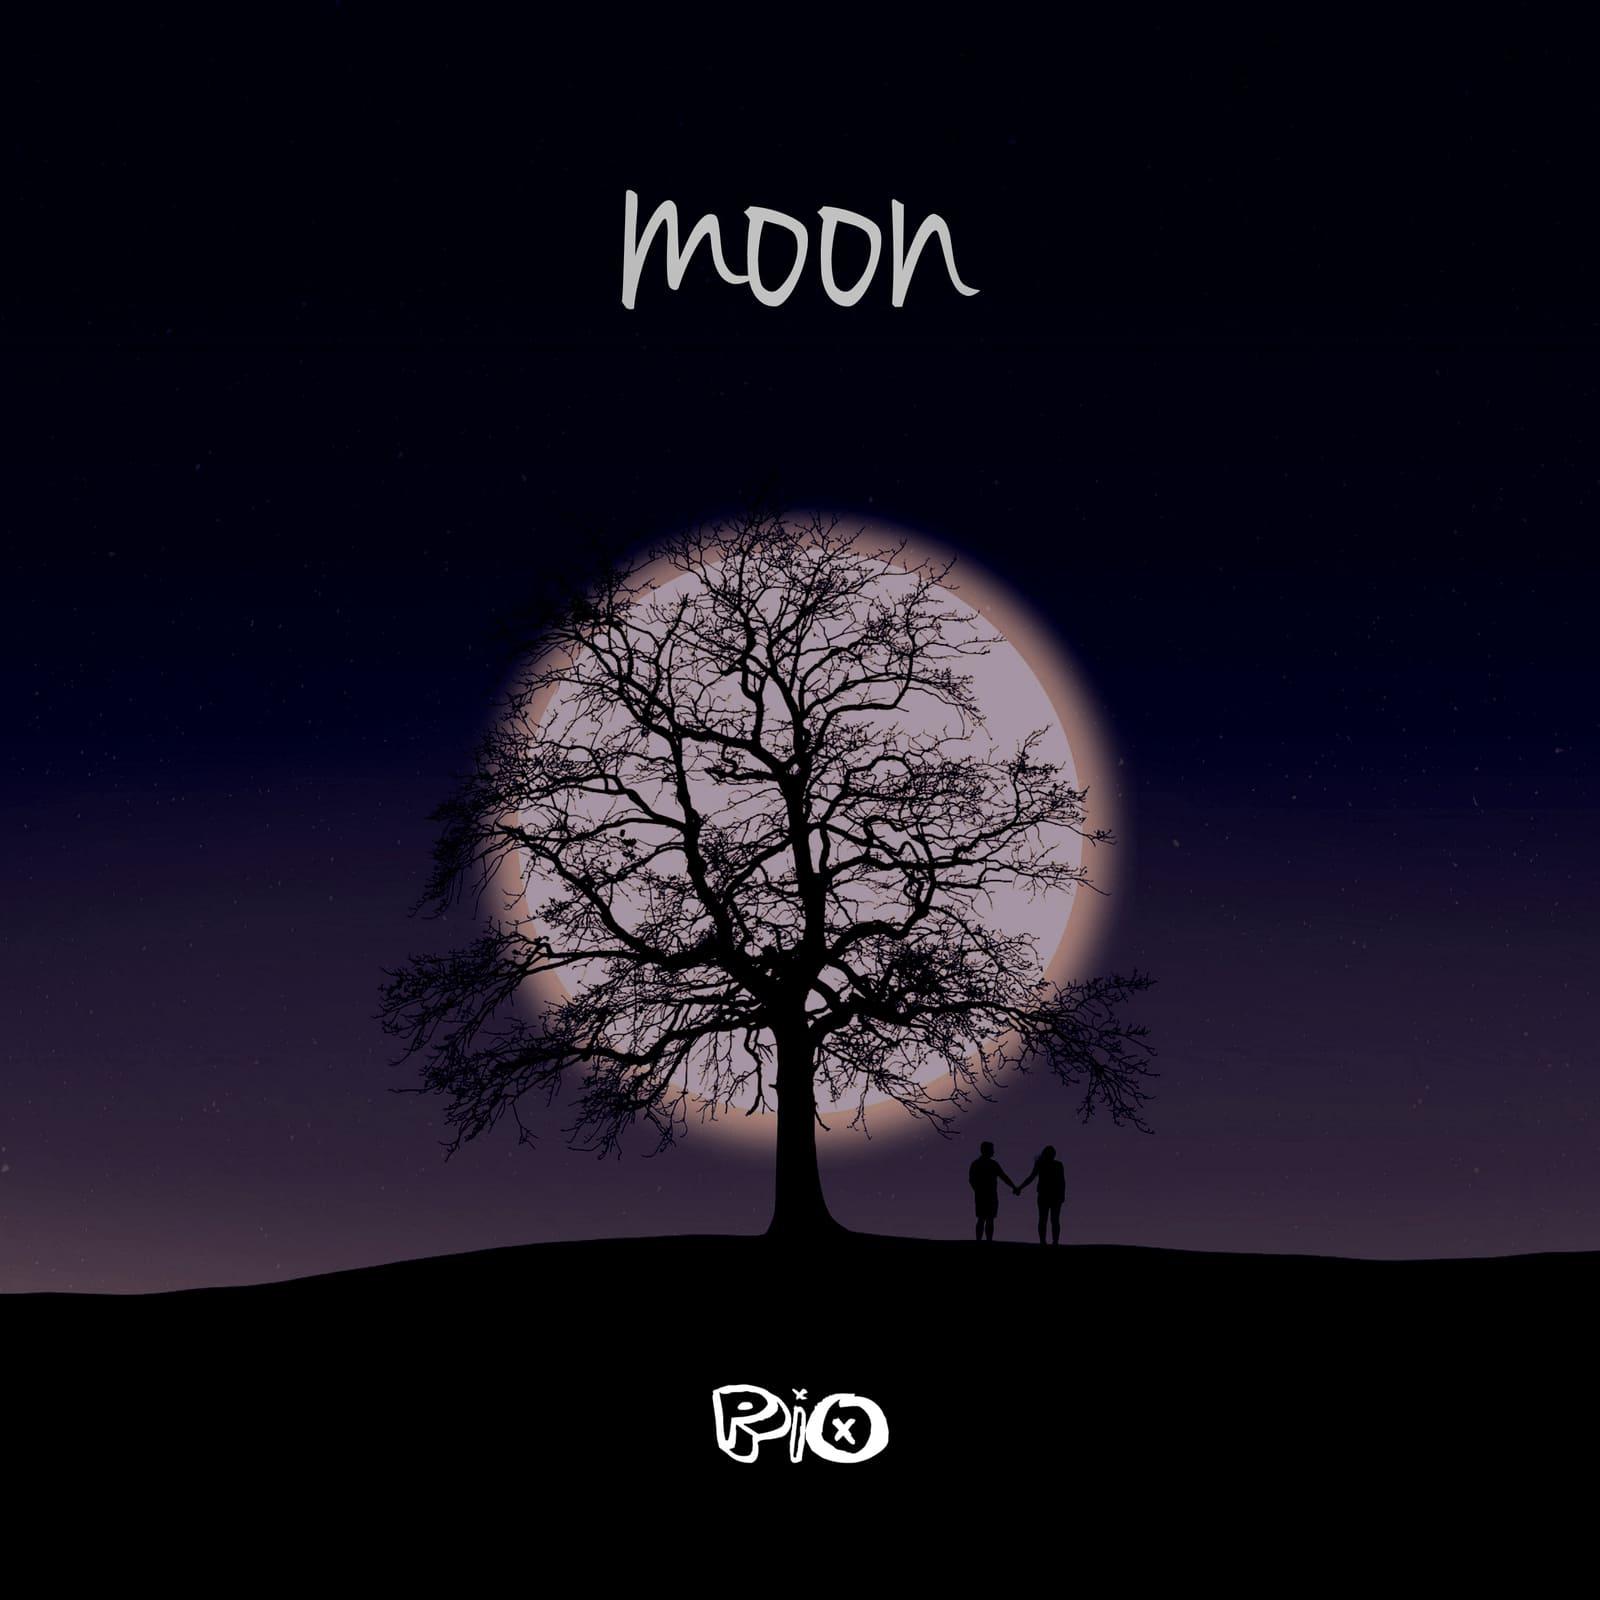 Upcoming: Pio - Moon